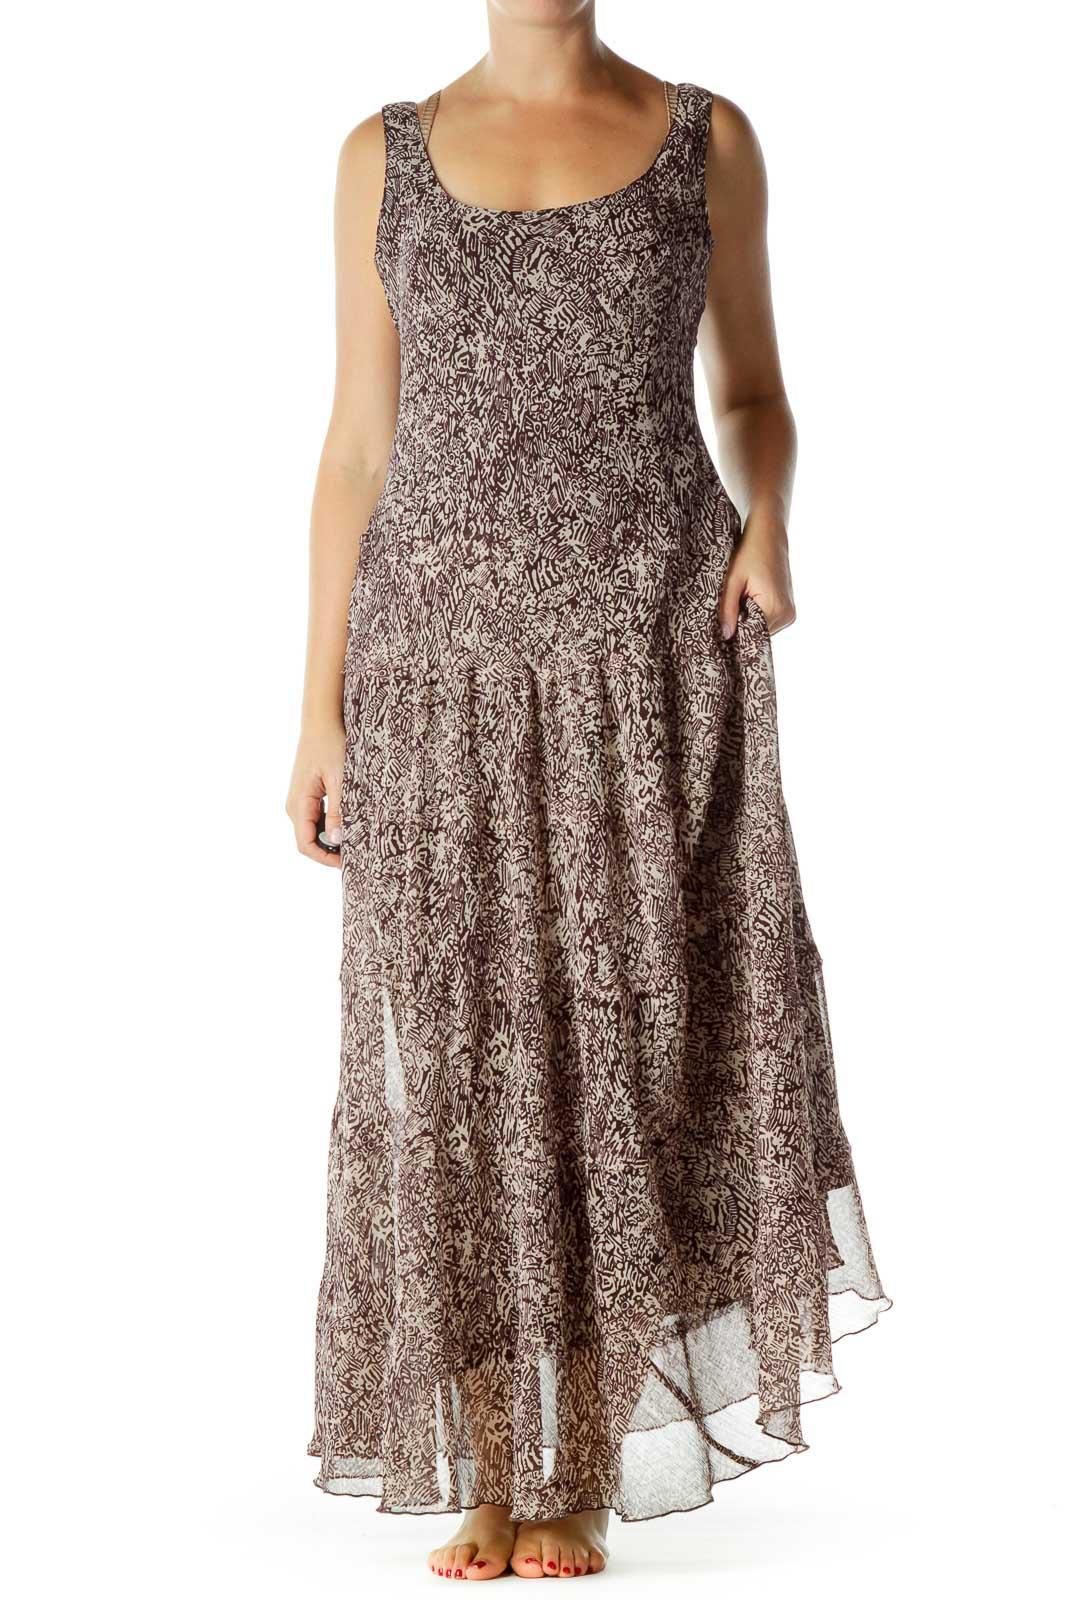 Brown Print Maxi Dress Front